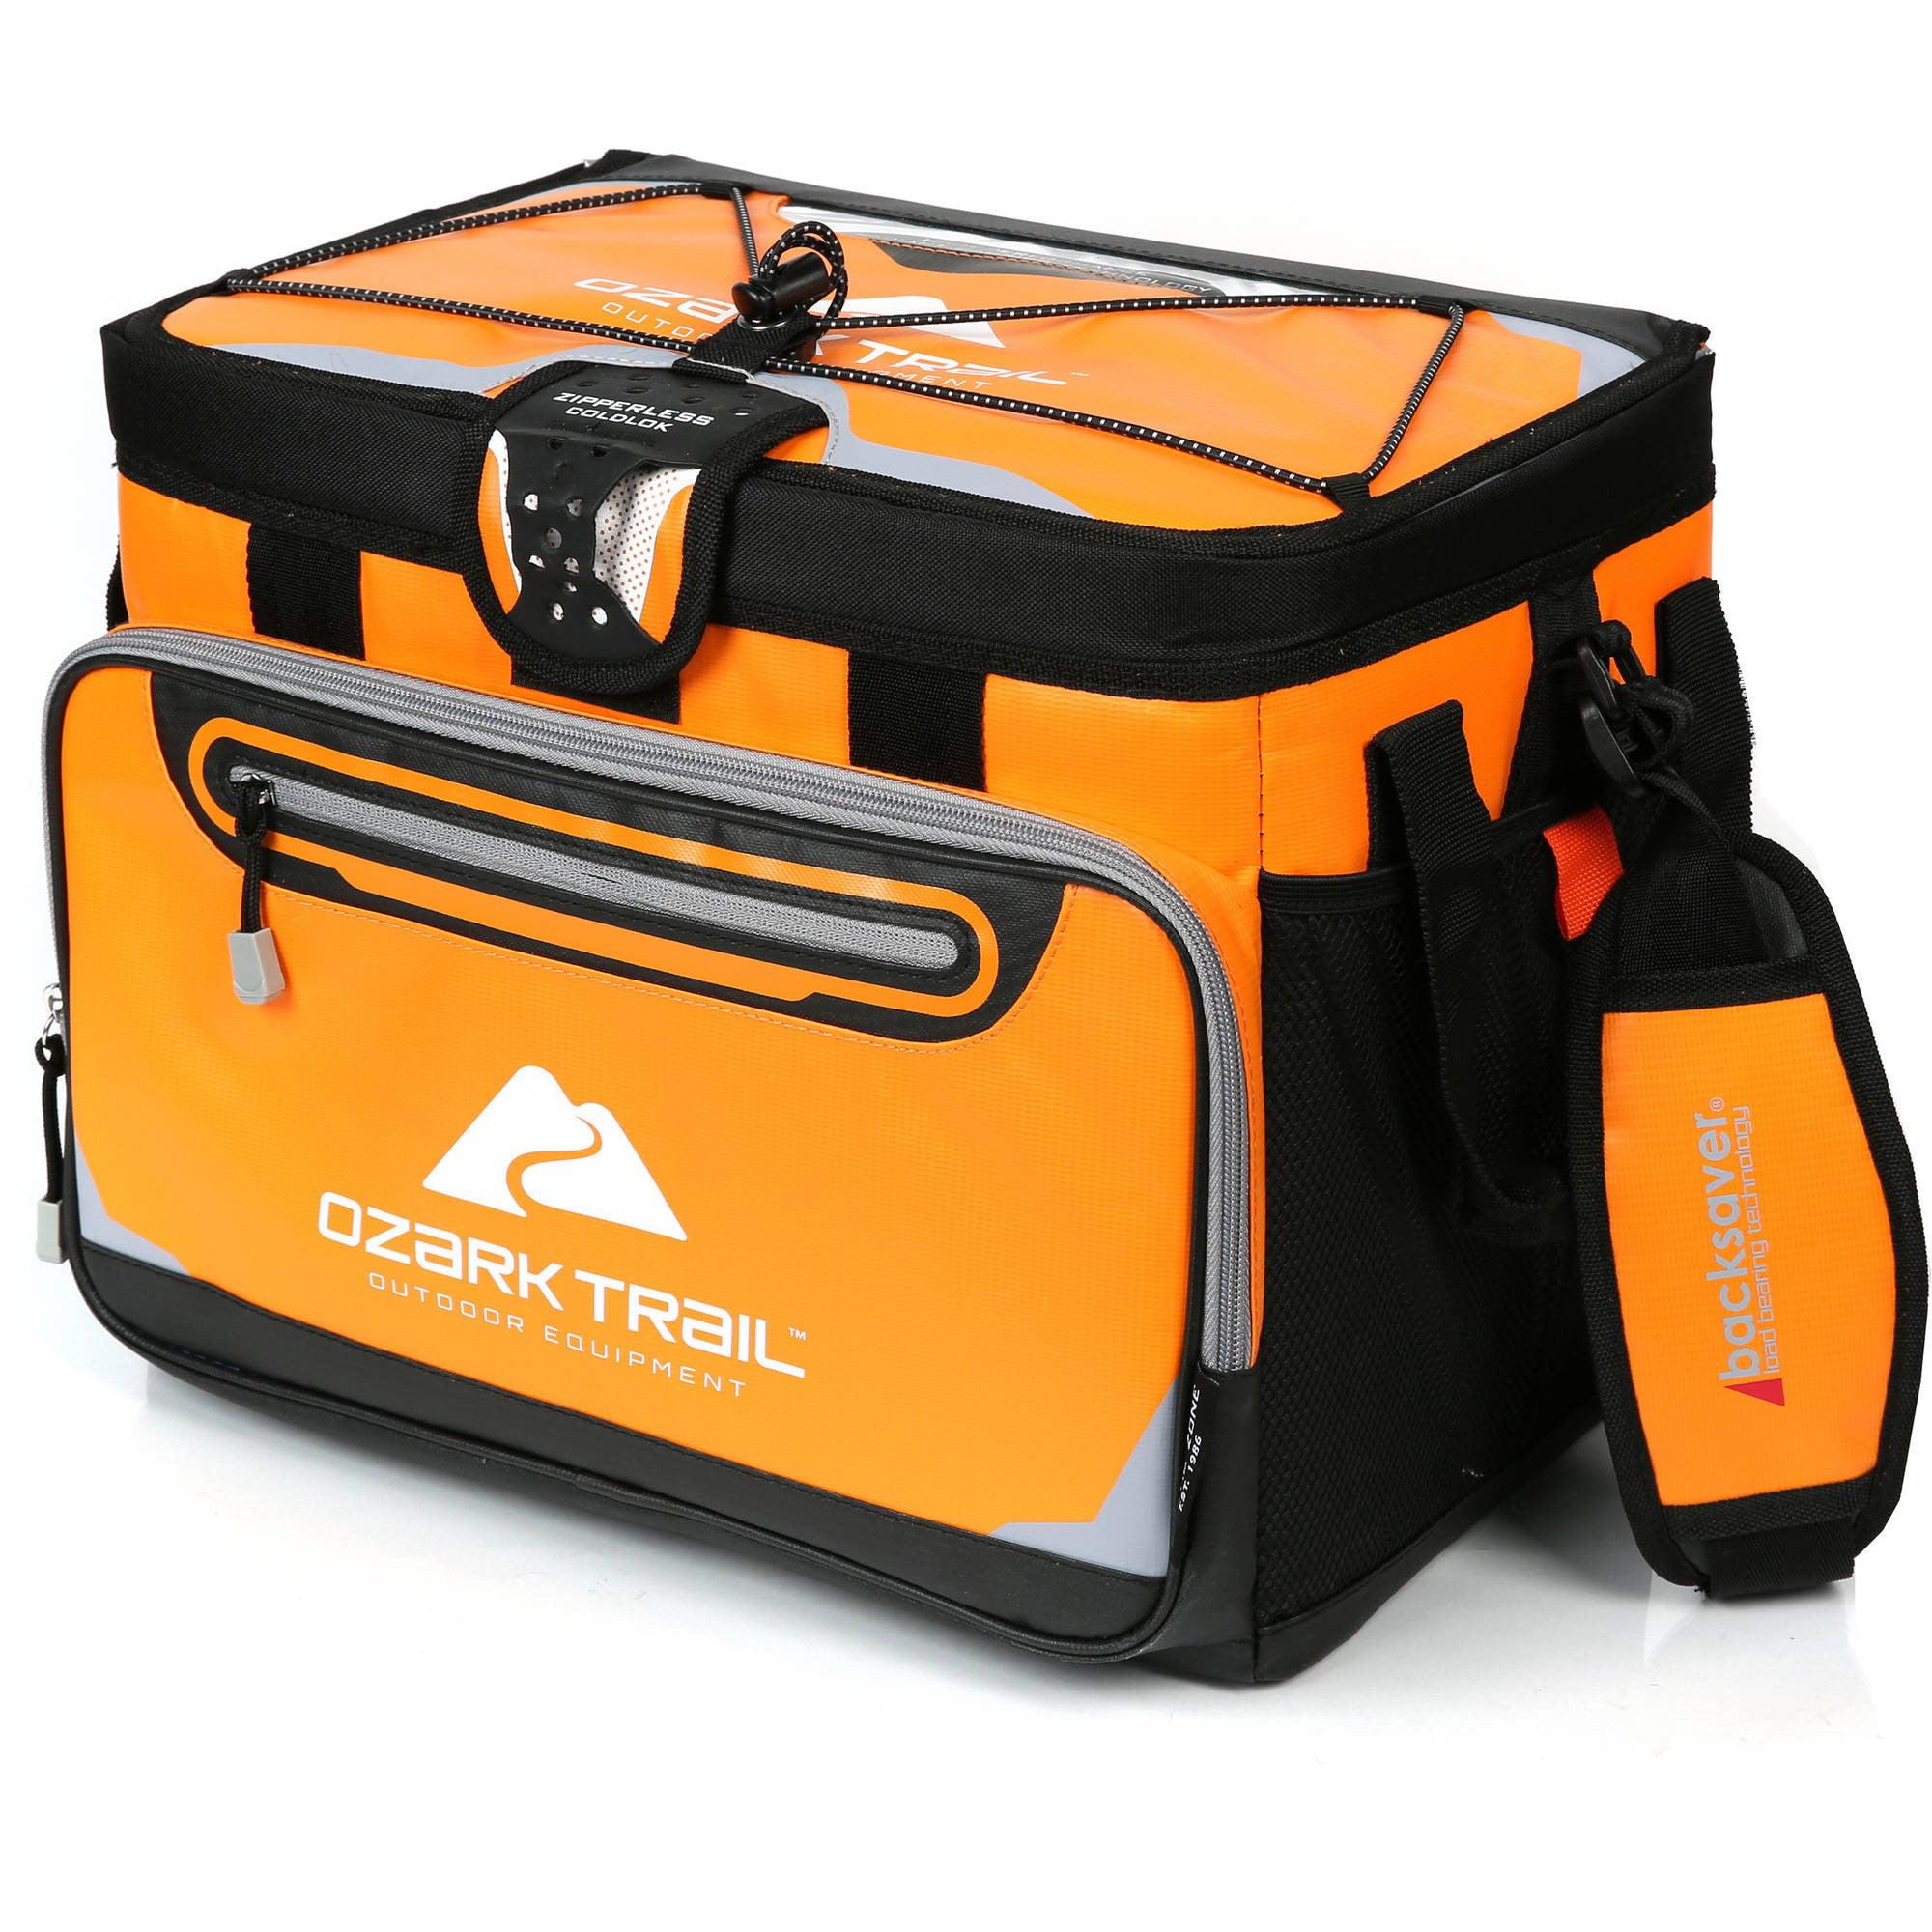 Ozark Trail 30-Can Zipperless Cooler with Smartshelf, Orange